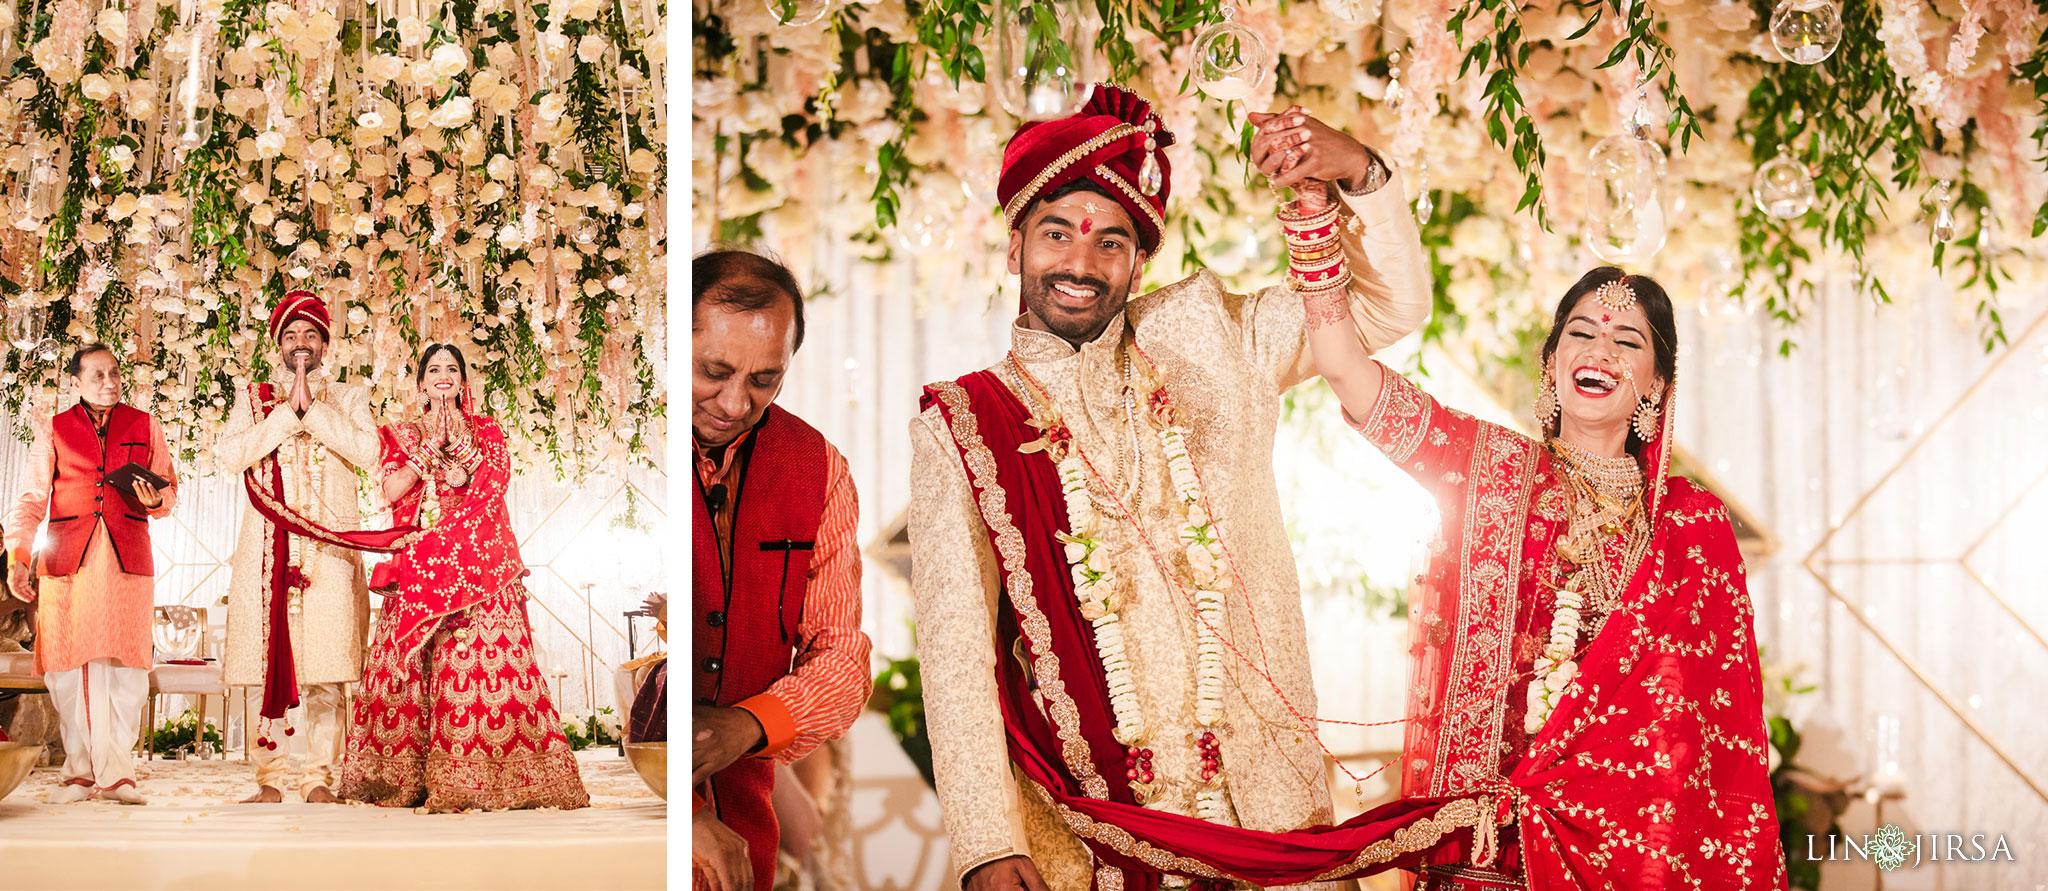 018 san jose marriott indian wedding photography